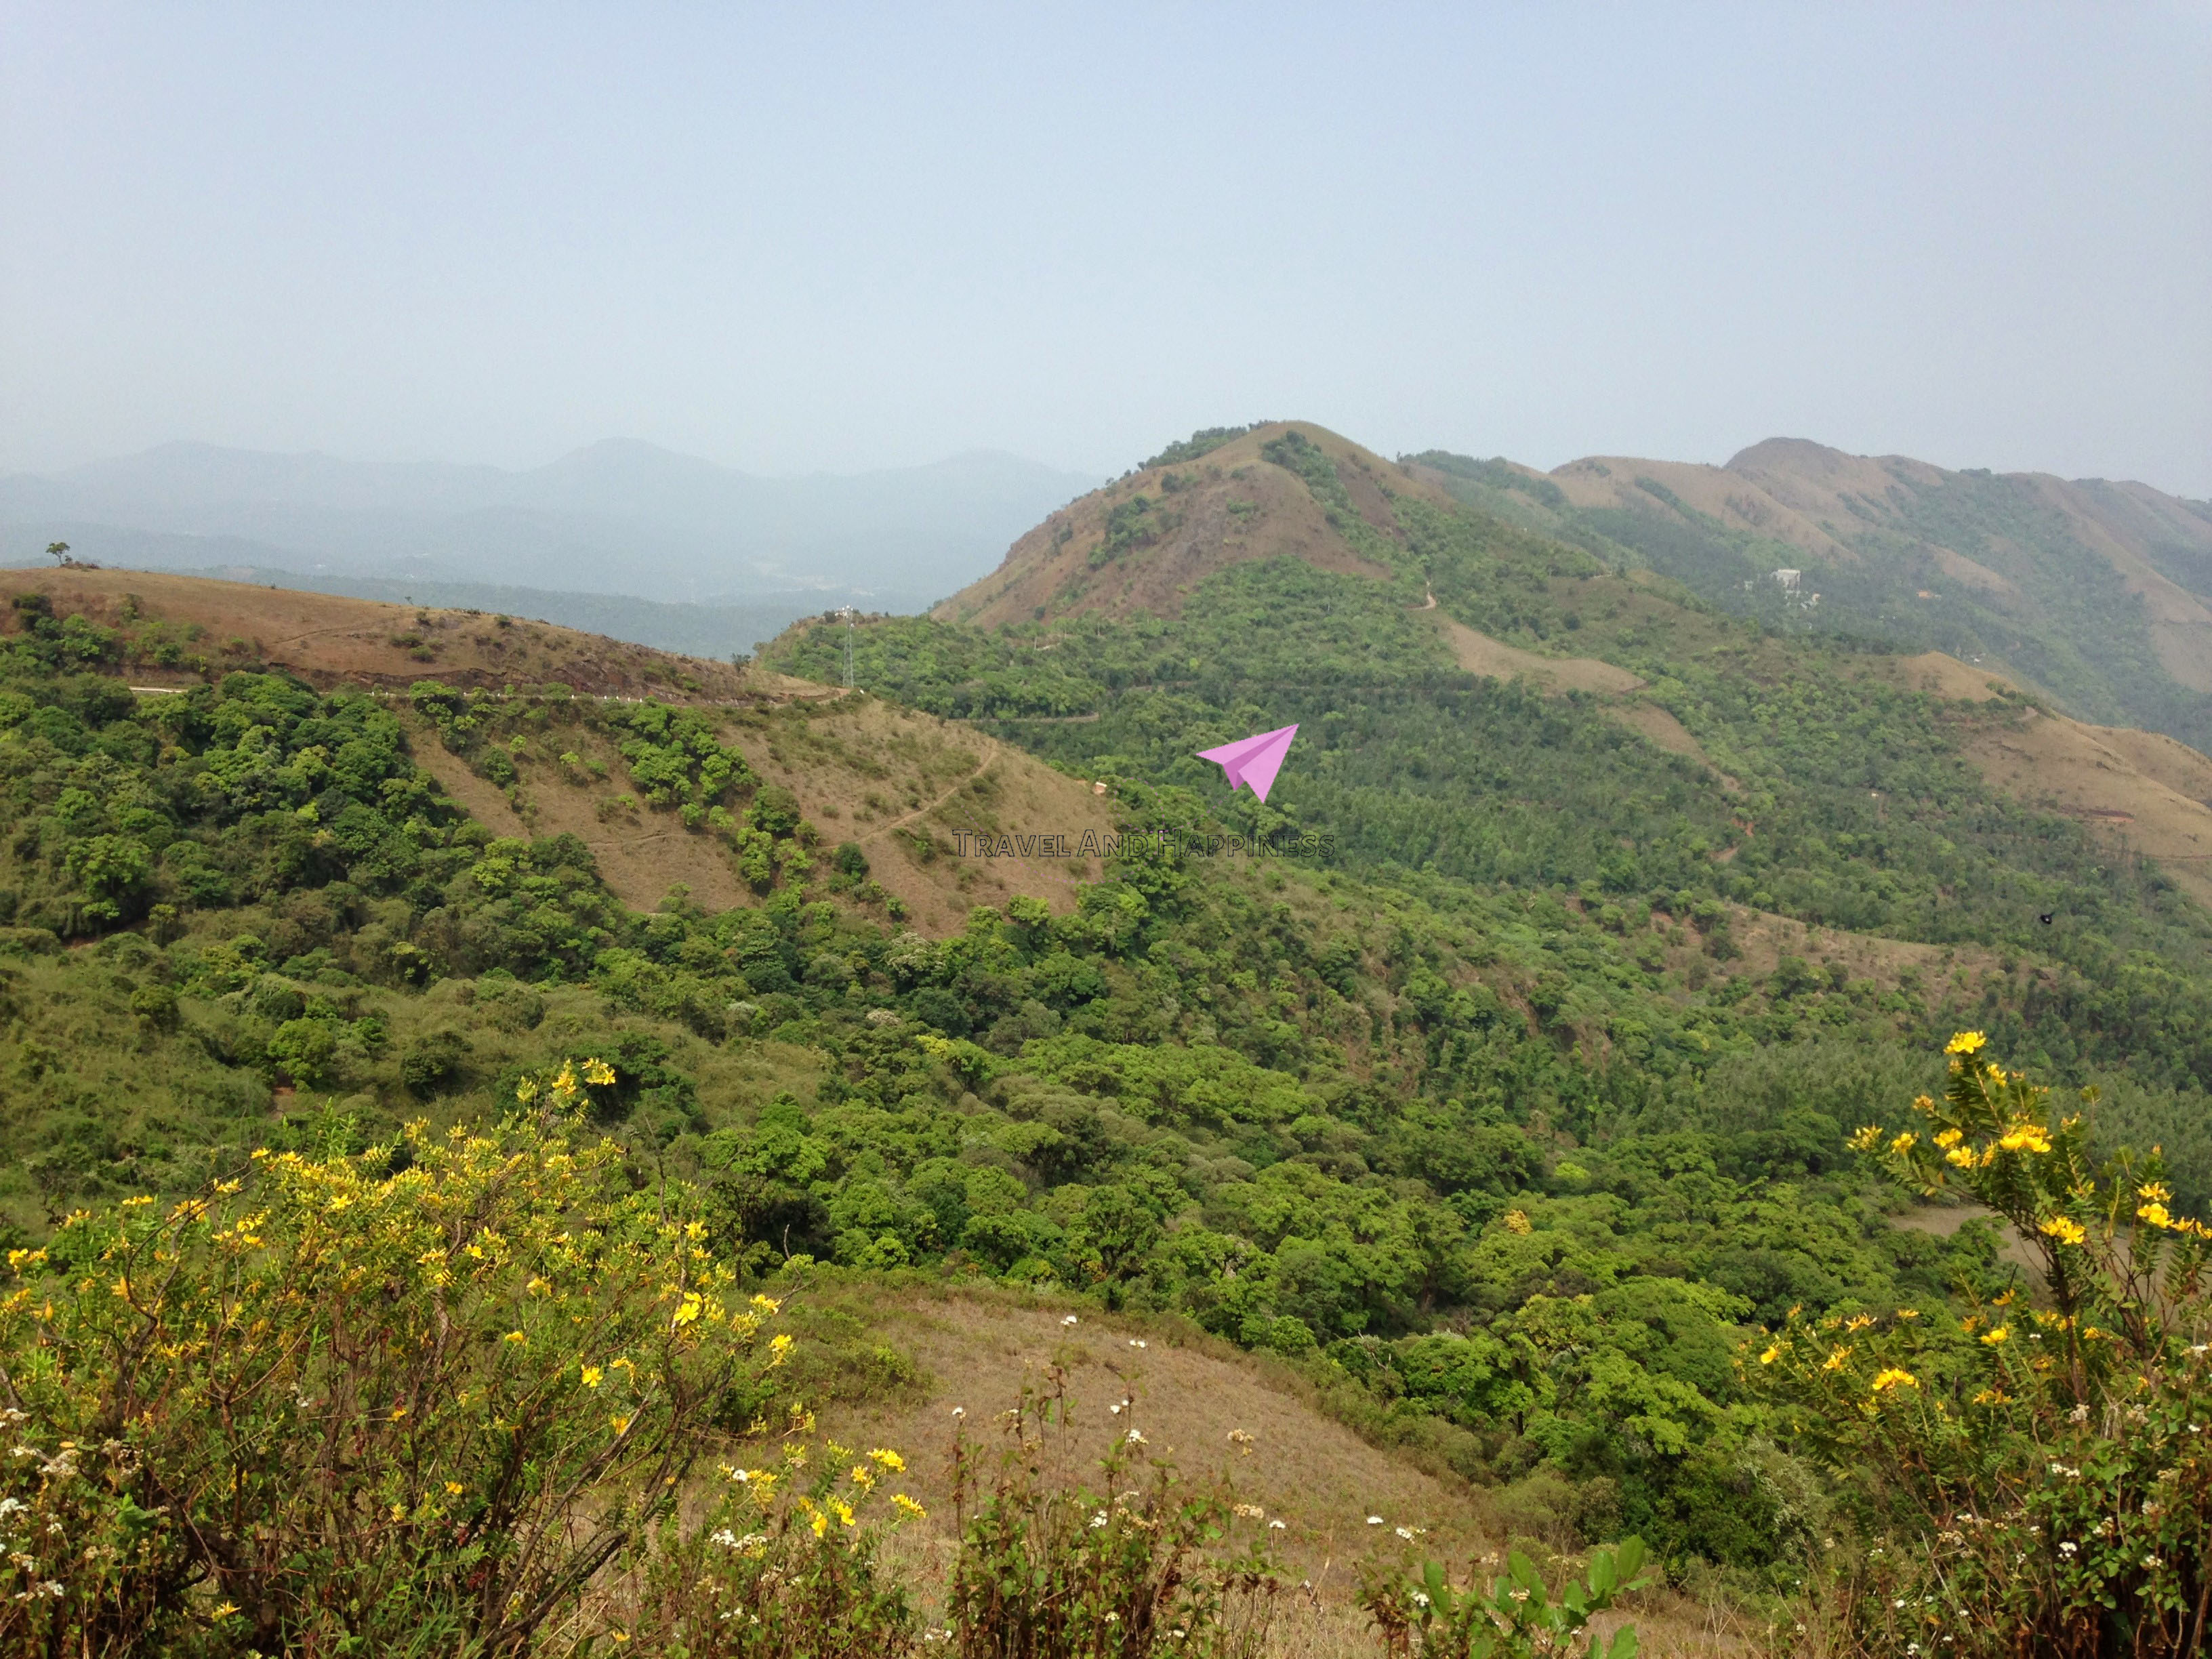 4. Western ghats in Karnataka